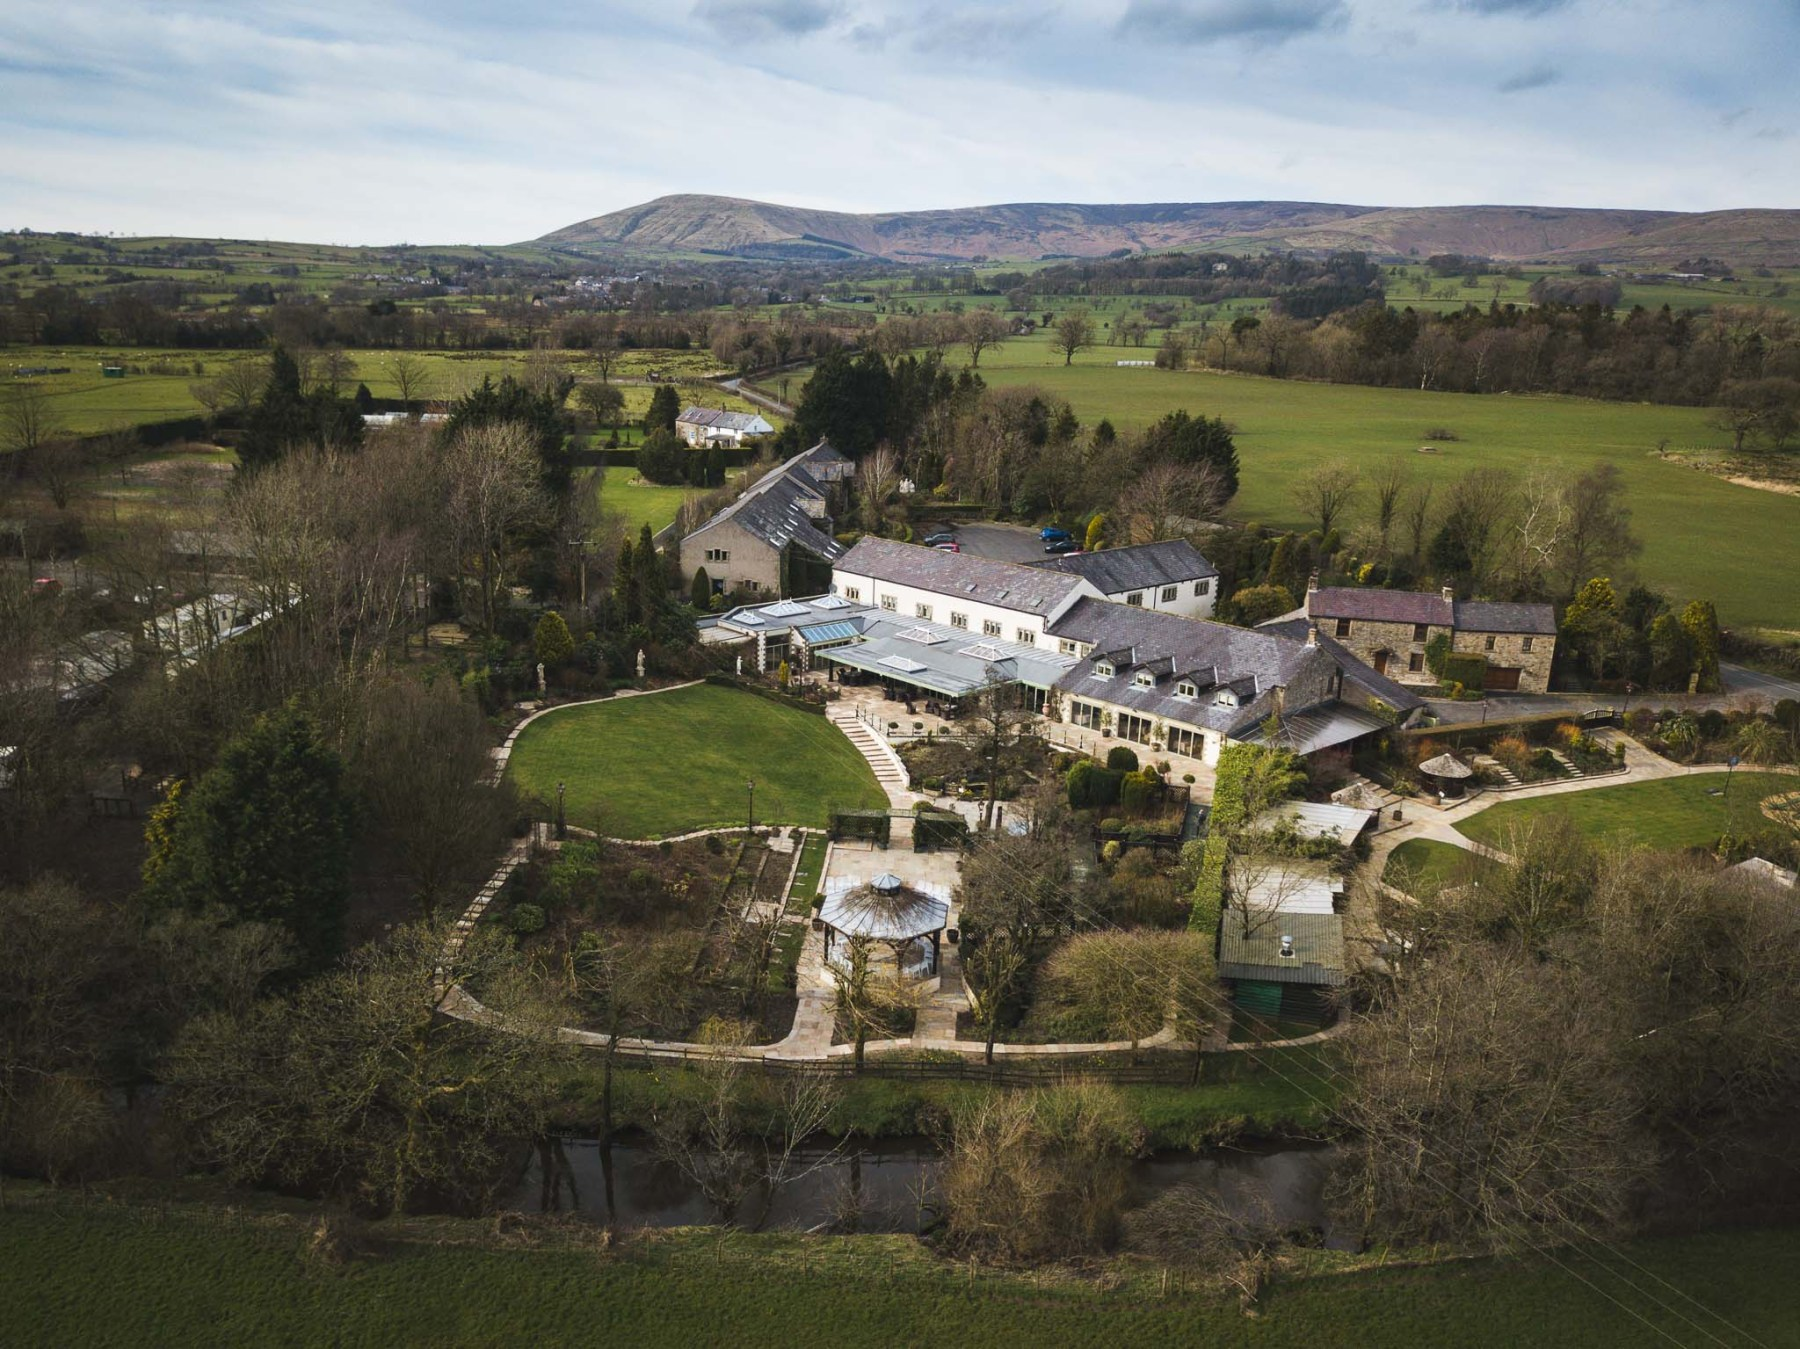 Drone image of Gibbon Bridge wedding venue in Lancashire